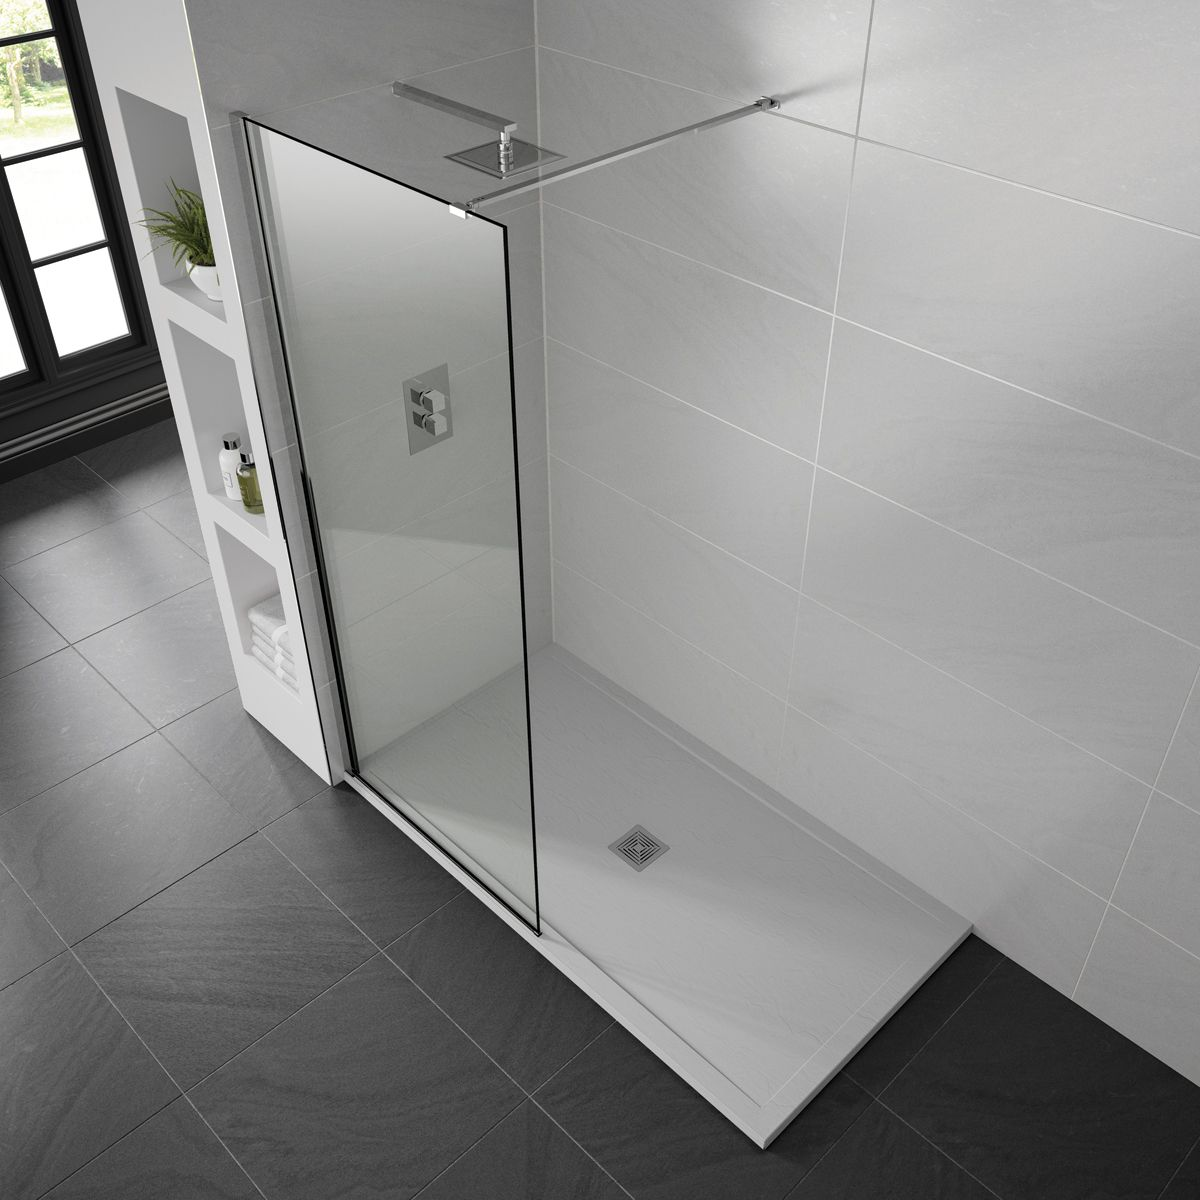 Aquadart White Slate Shower Tray 1500 x 900 Lifestyle